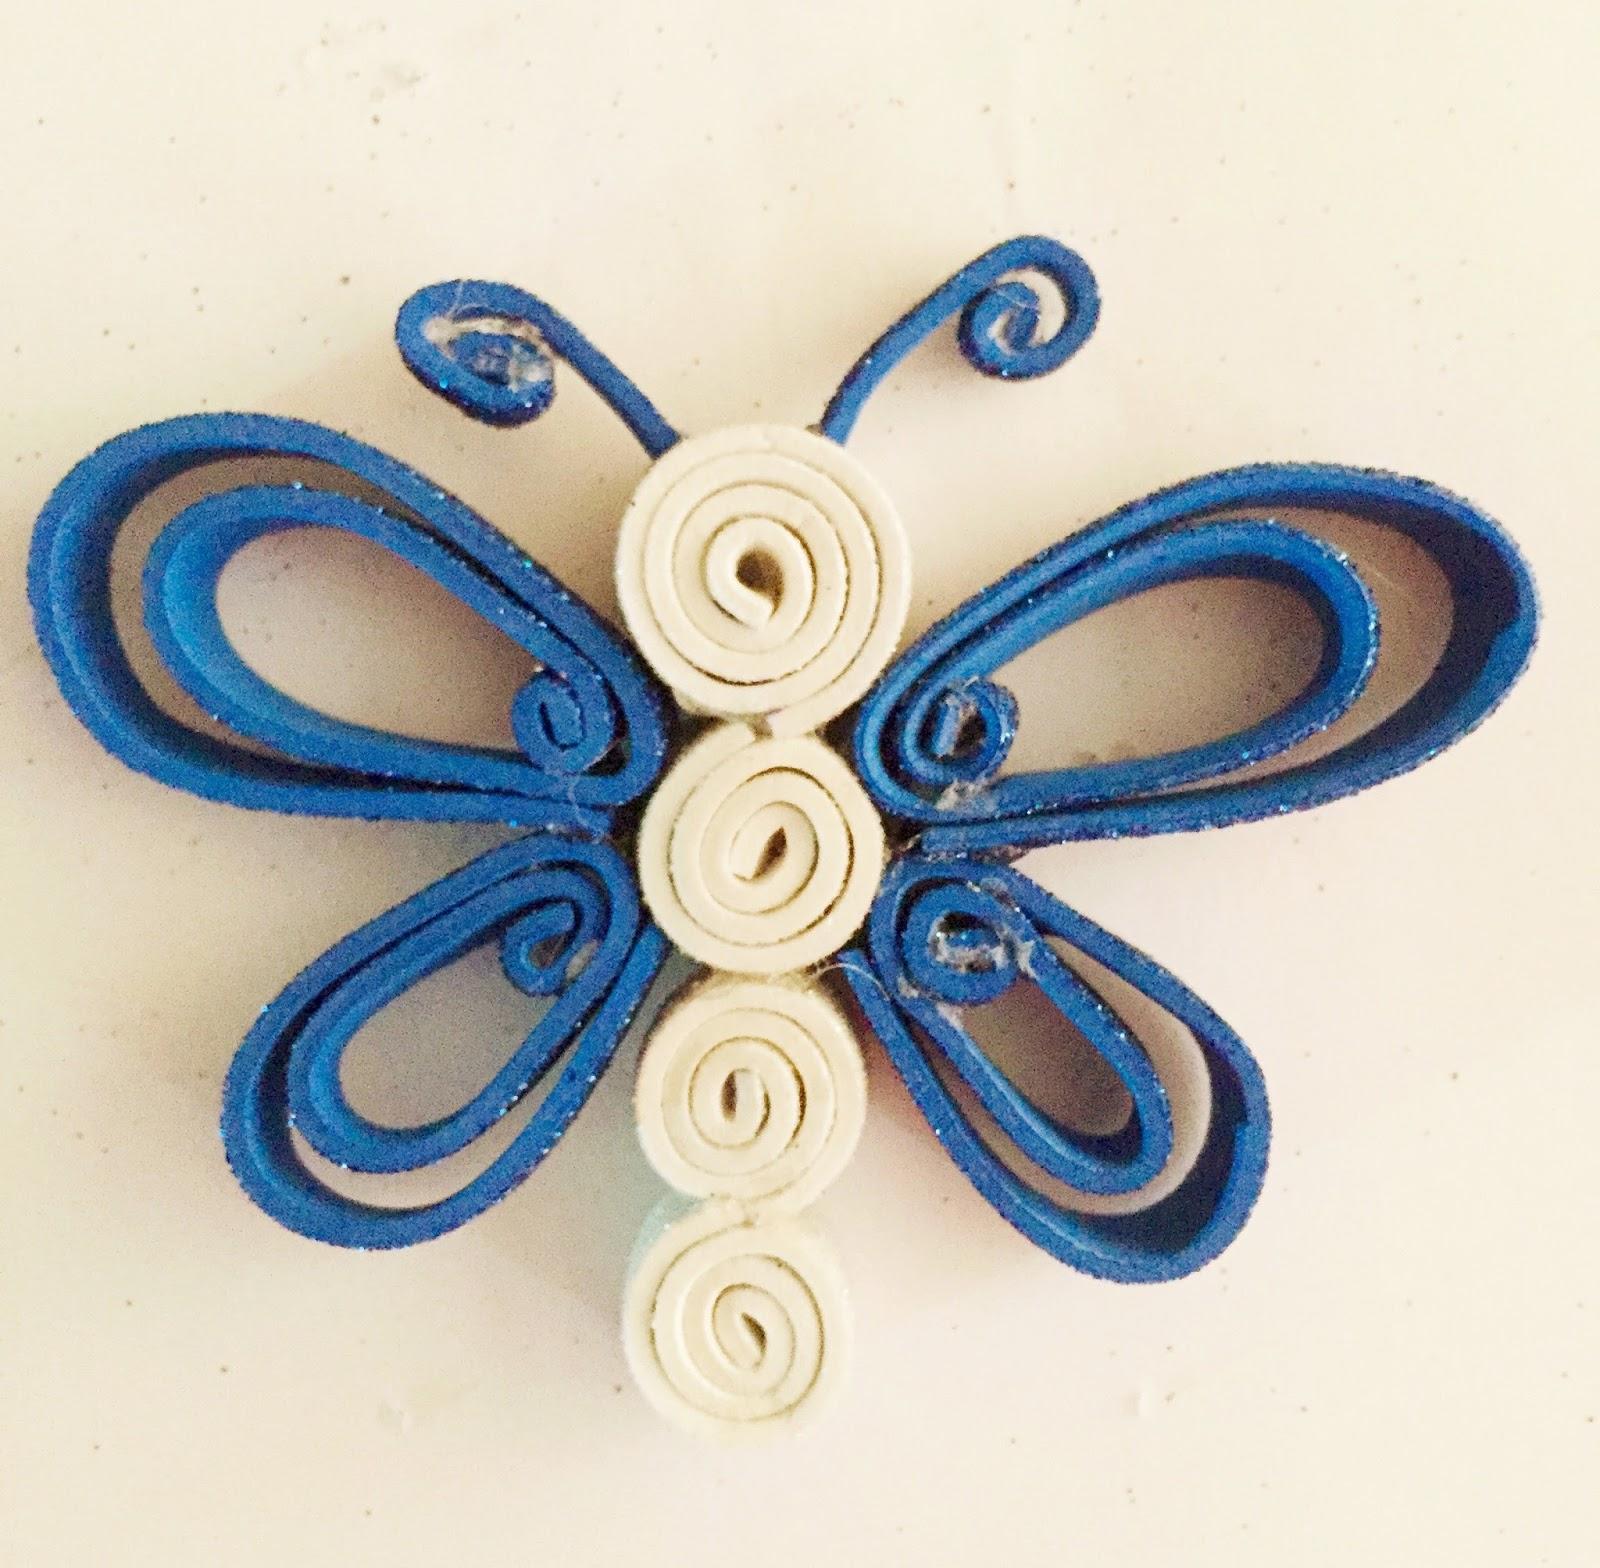 Mi mundo creativo mariposa de goma eva - Como hacer mariposas de goma eva ...